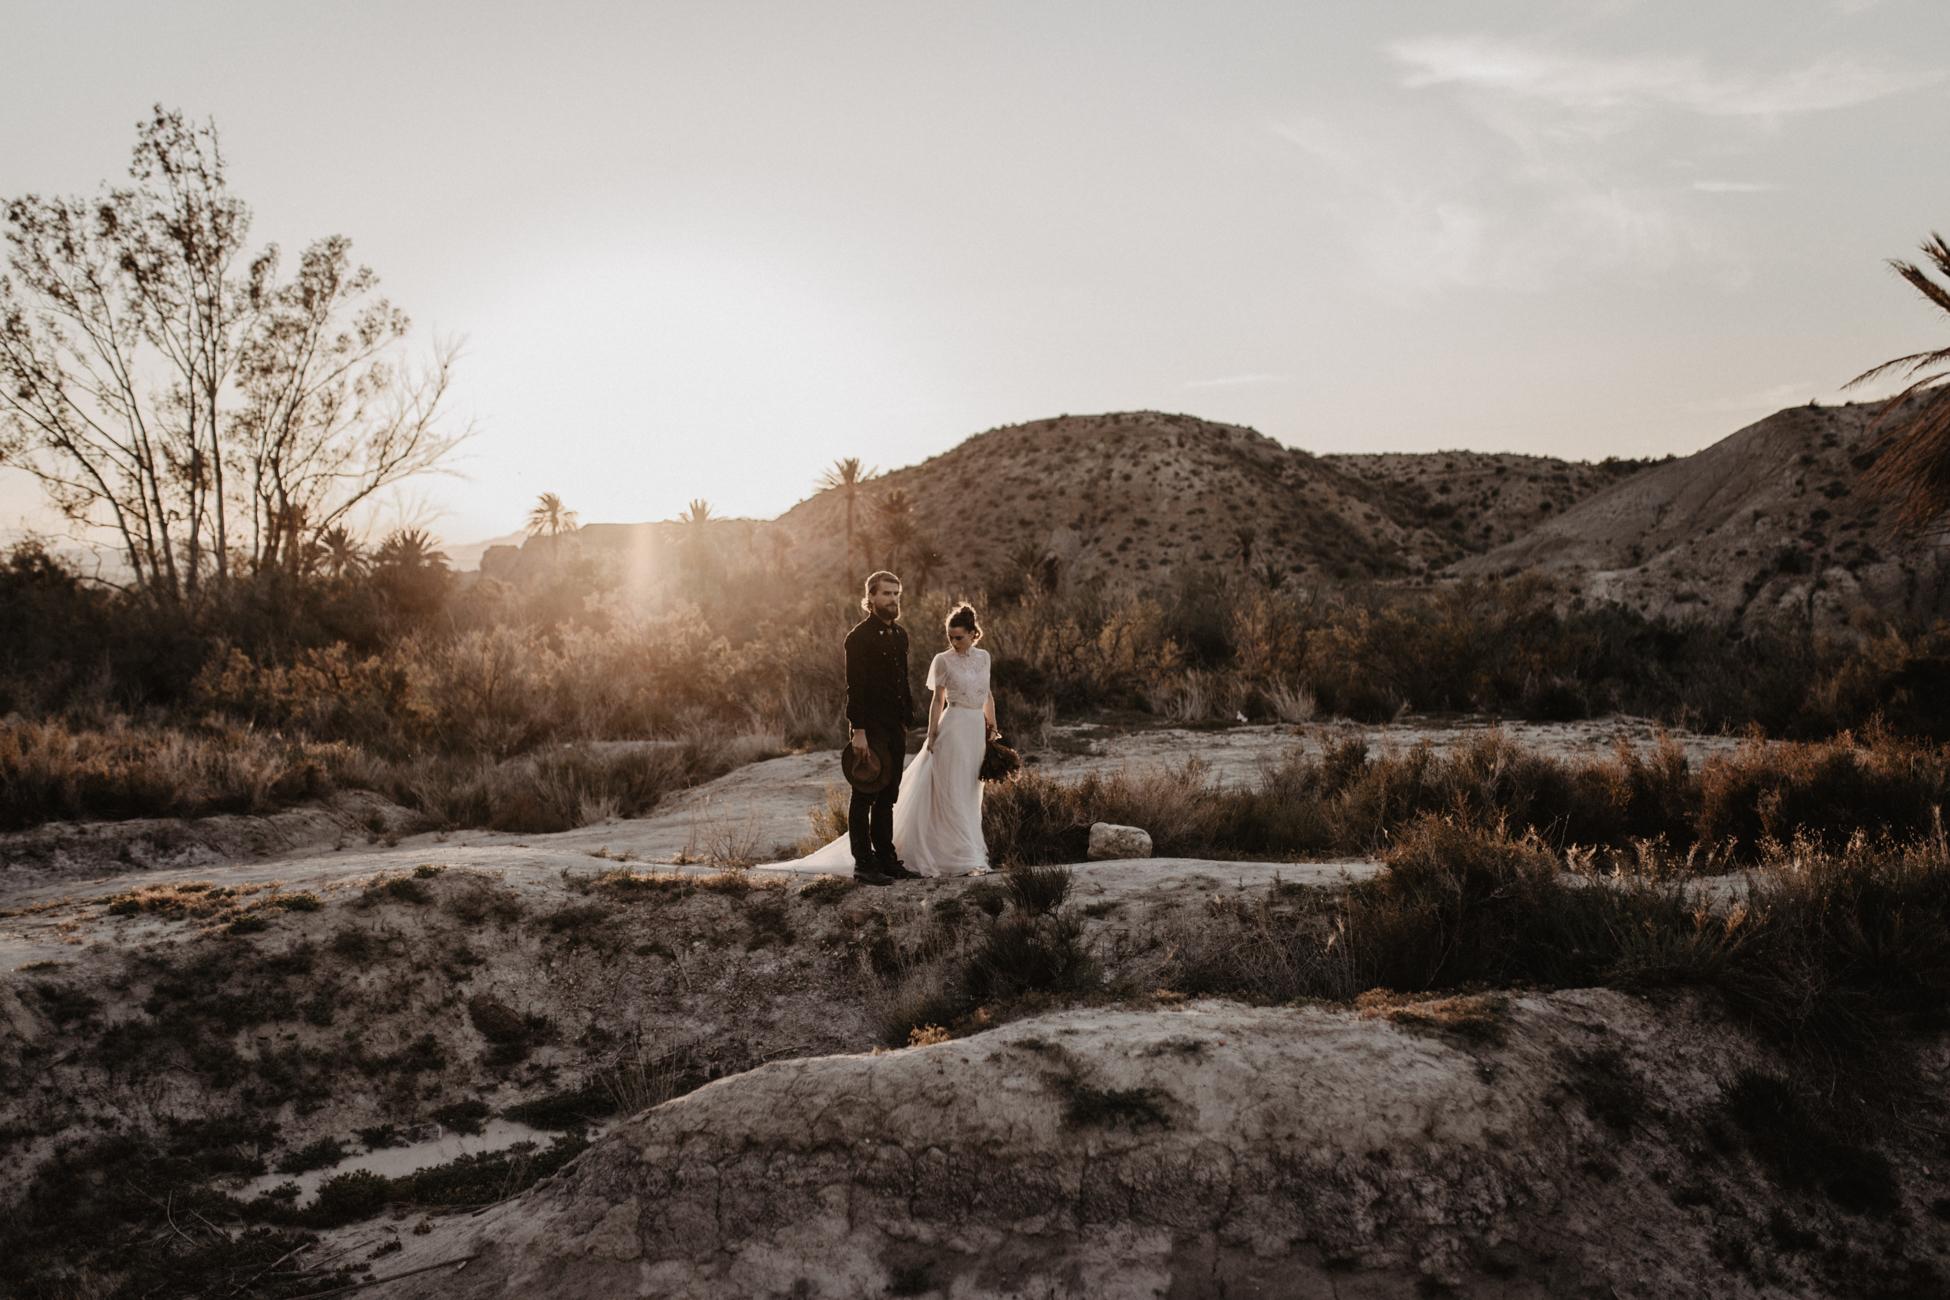 thenortherngirlphotography_photography_thenortherngirl_rebeccascabros_wedding_weddingphotography_weddingphotographer_wood_muebles_deco_bodasdecaramelo_home_bedtime_gaywedding_editorial_desierto_desert_wildestdreams_amortexano-323.jpg